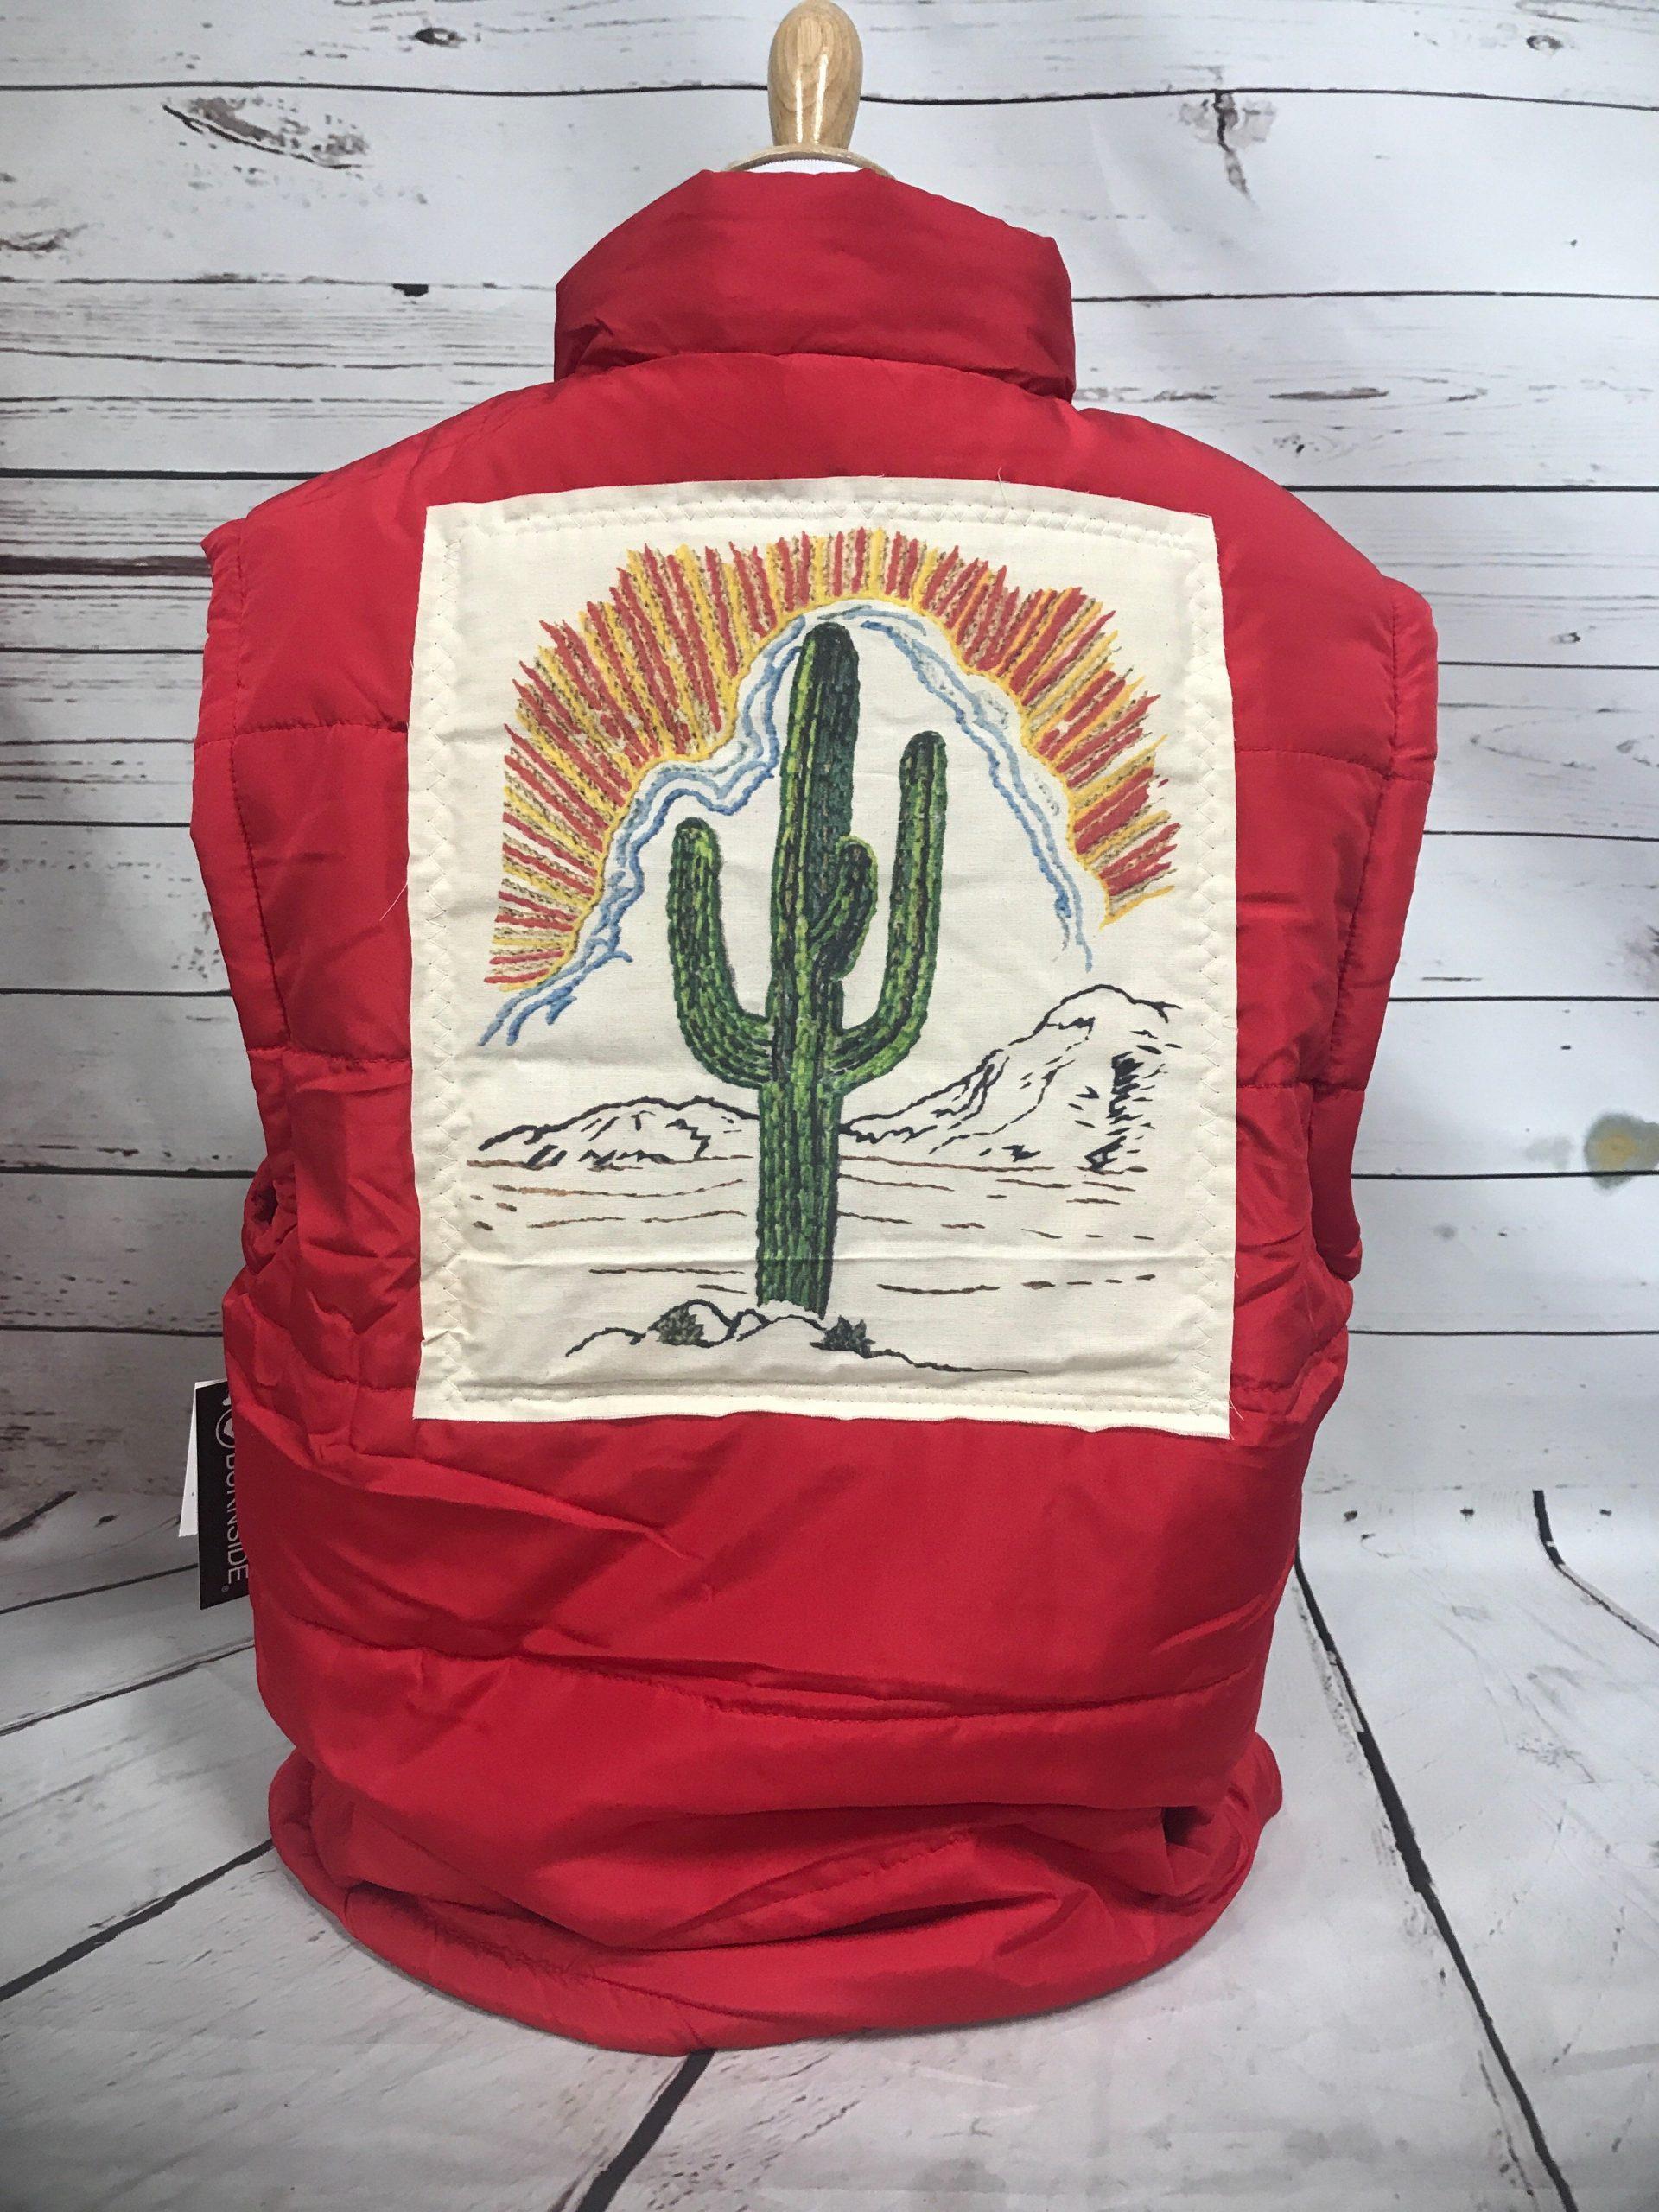 Sunset Cactus Cream Patch on Red Puff Vest